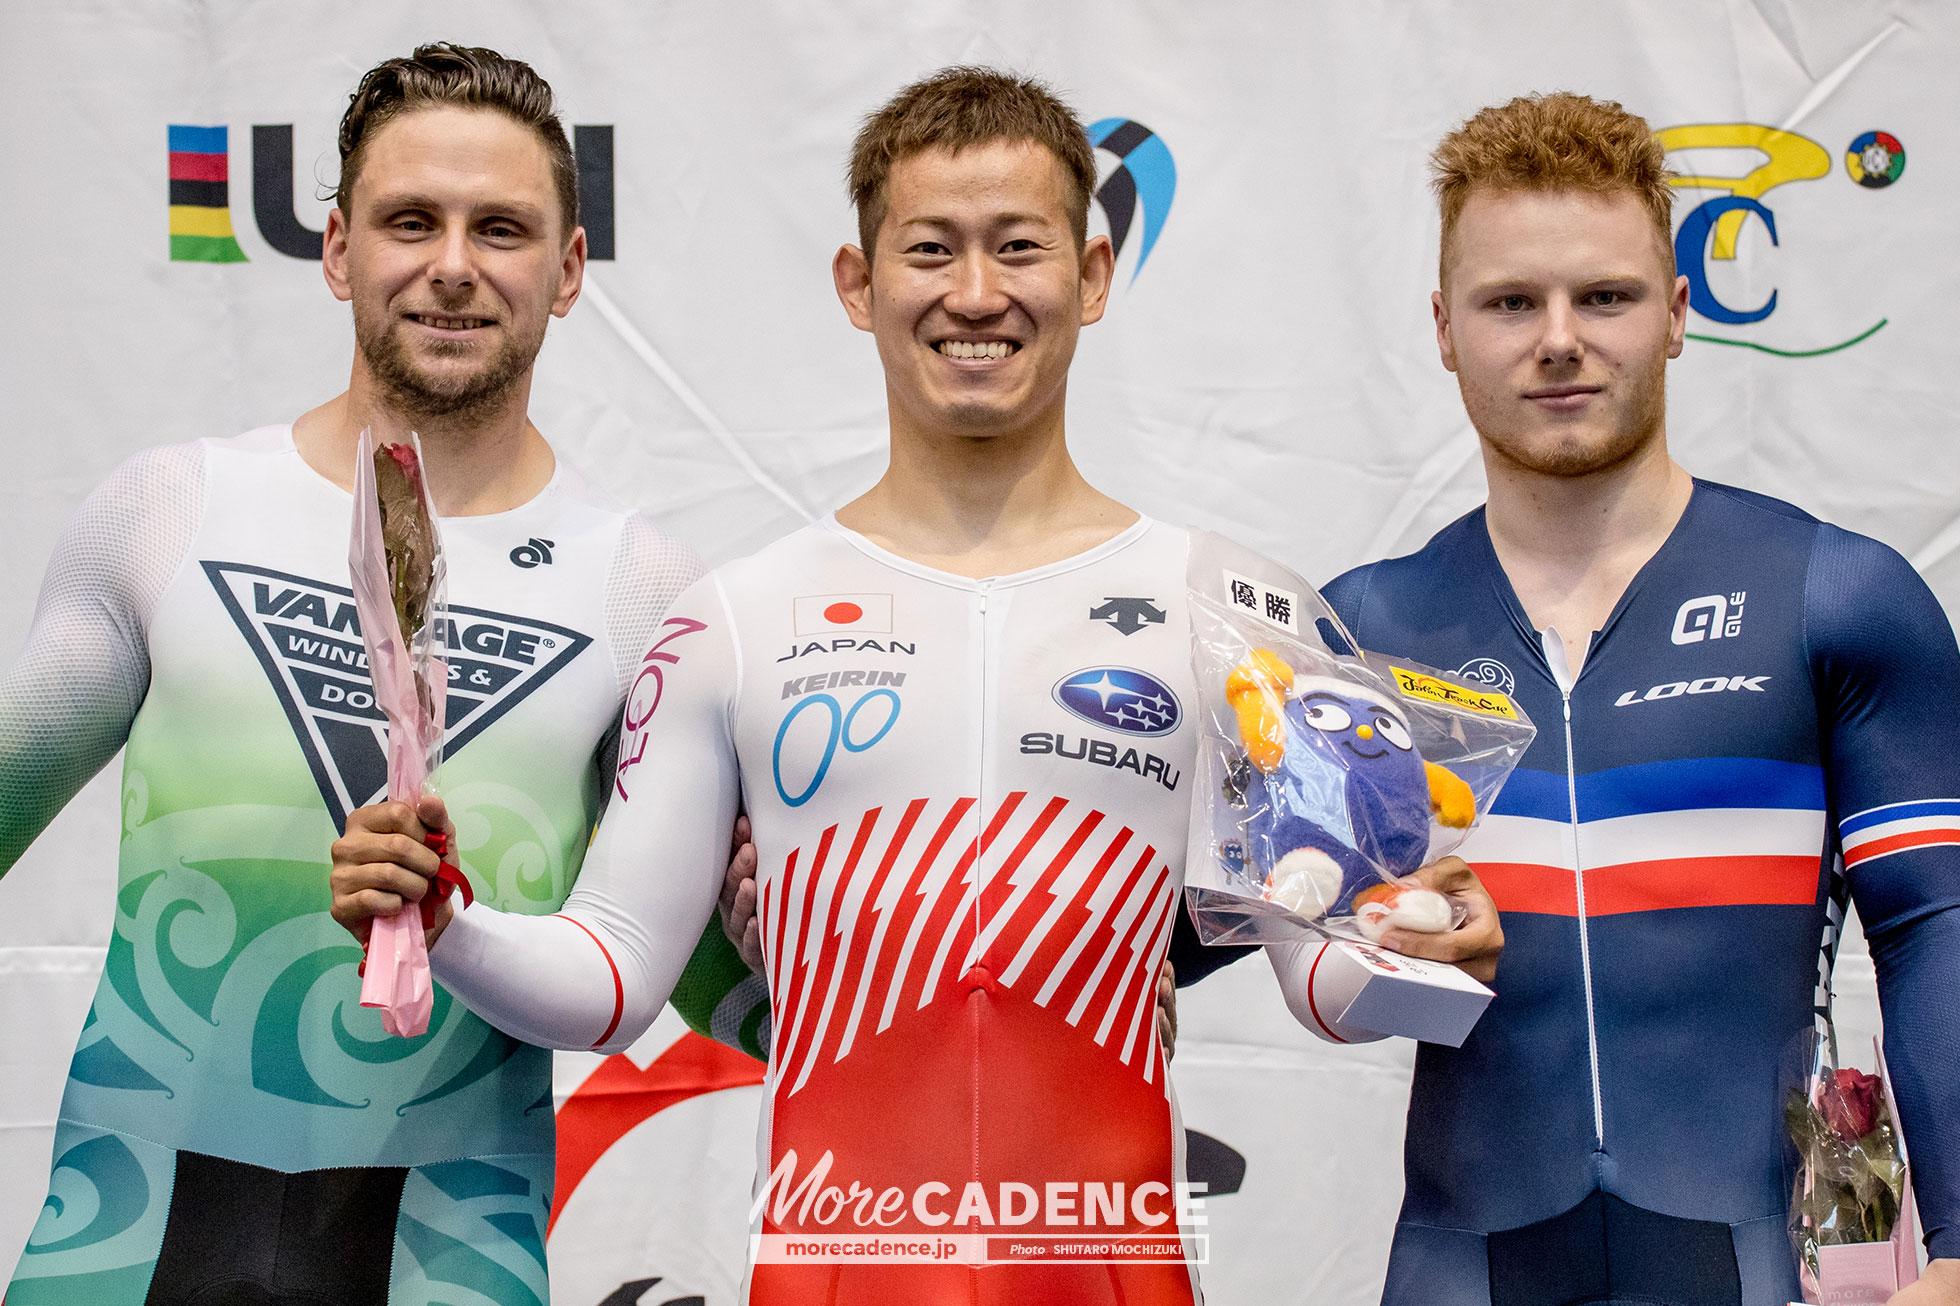 2018 Japan Track Cup 1 - Men's Keirin Final